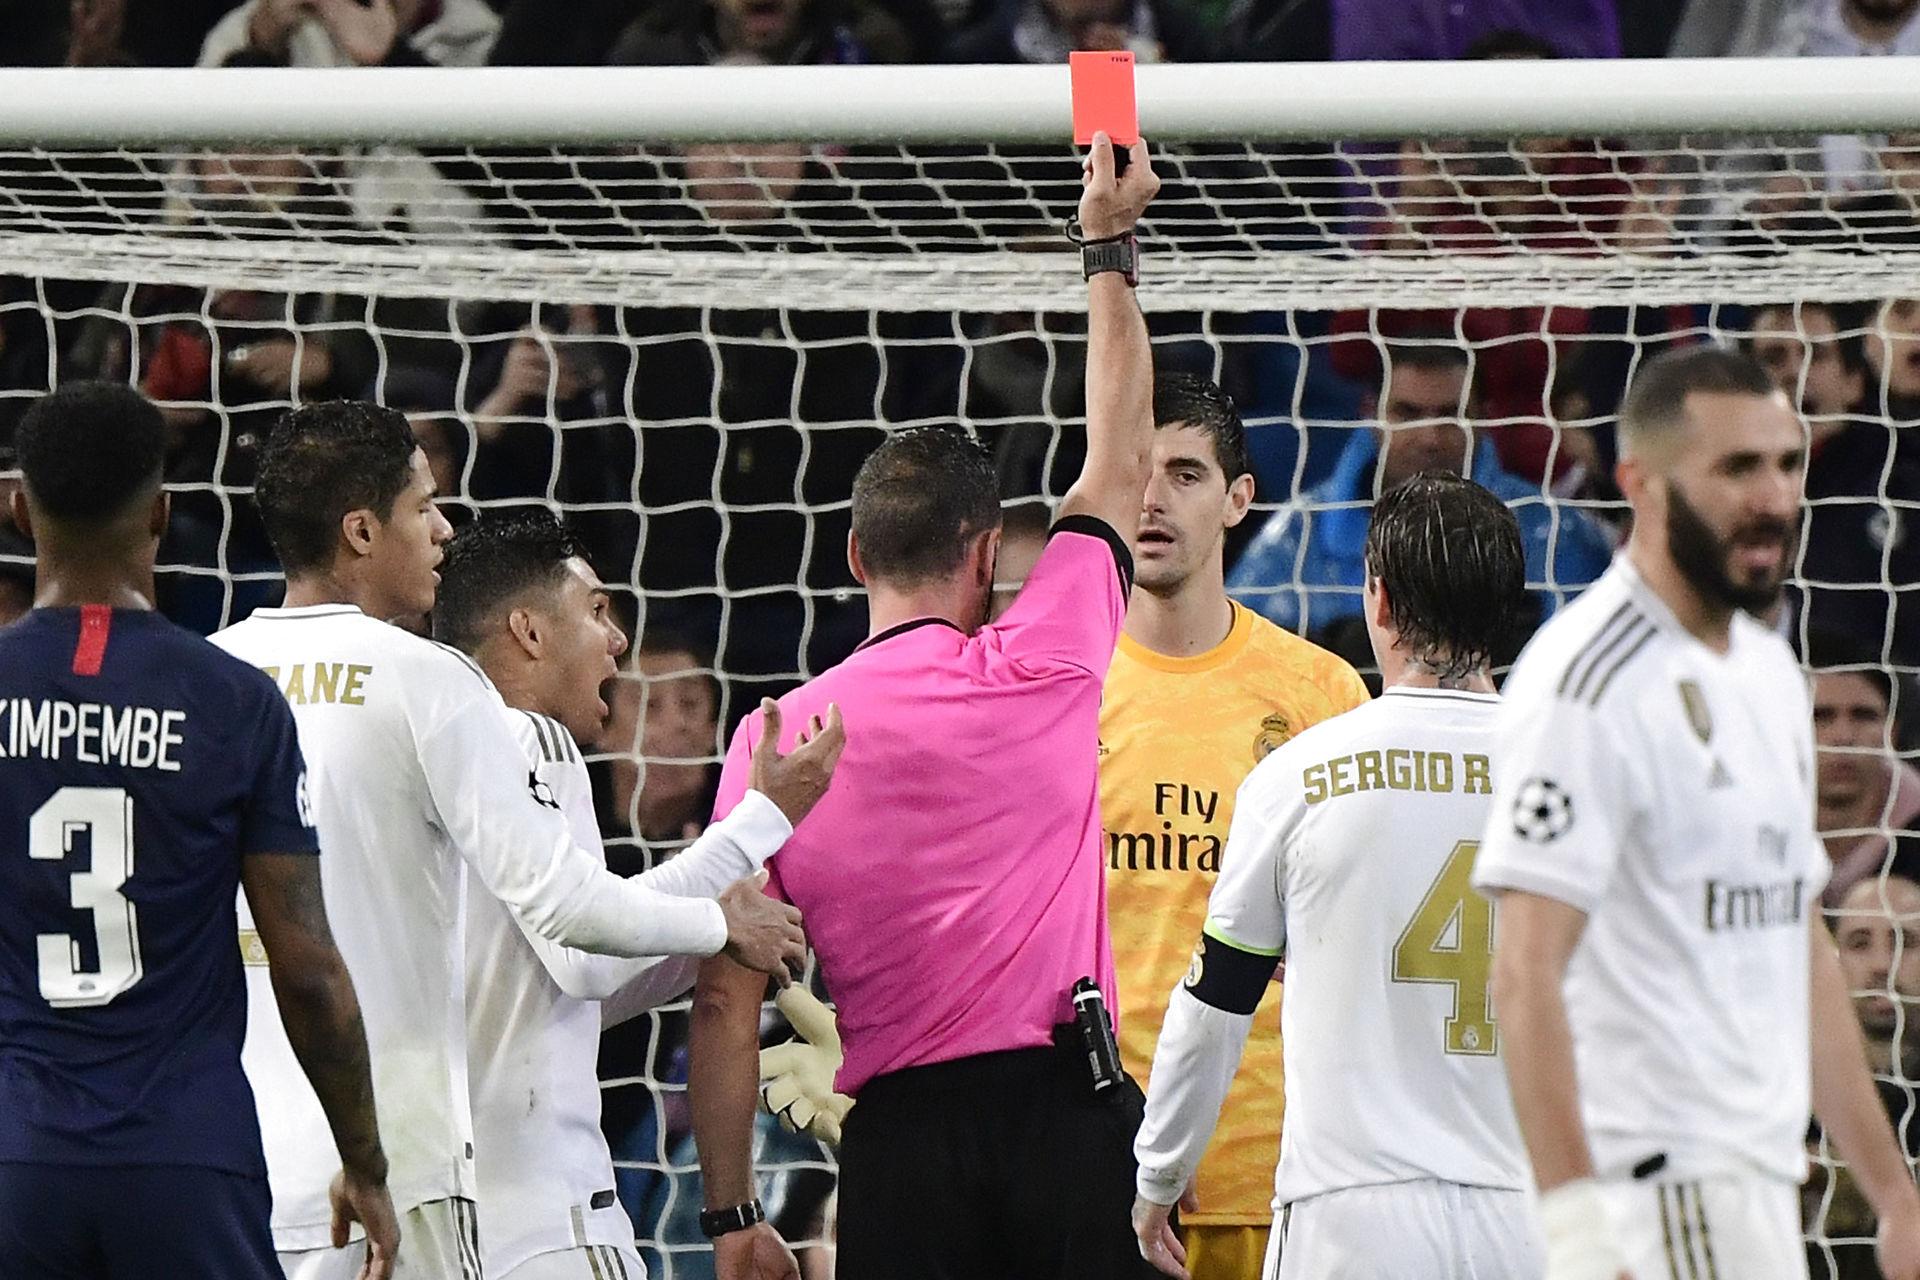 Реал Мадрид - ПСЖ, удаление Куртуа